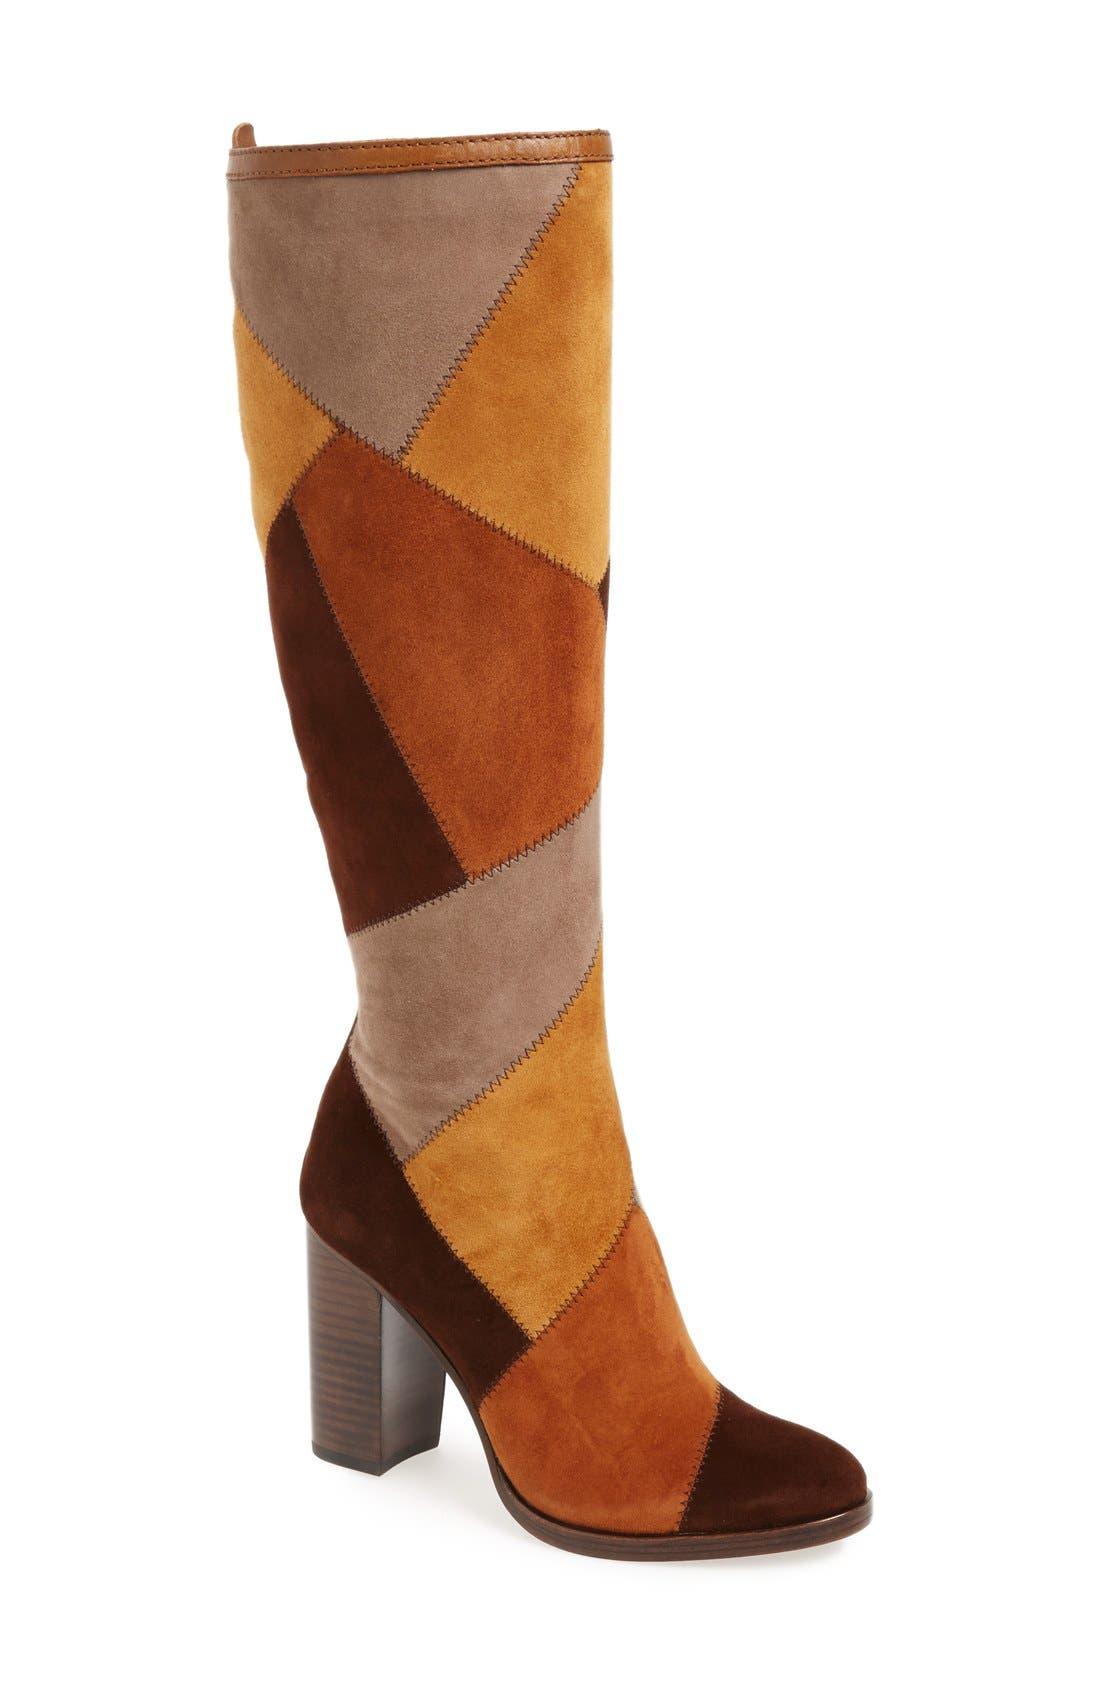 Main Image - Frye 'Claude' Knee High Patchwork Boot (Women)